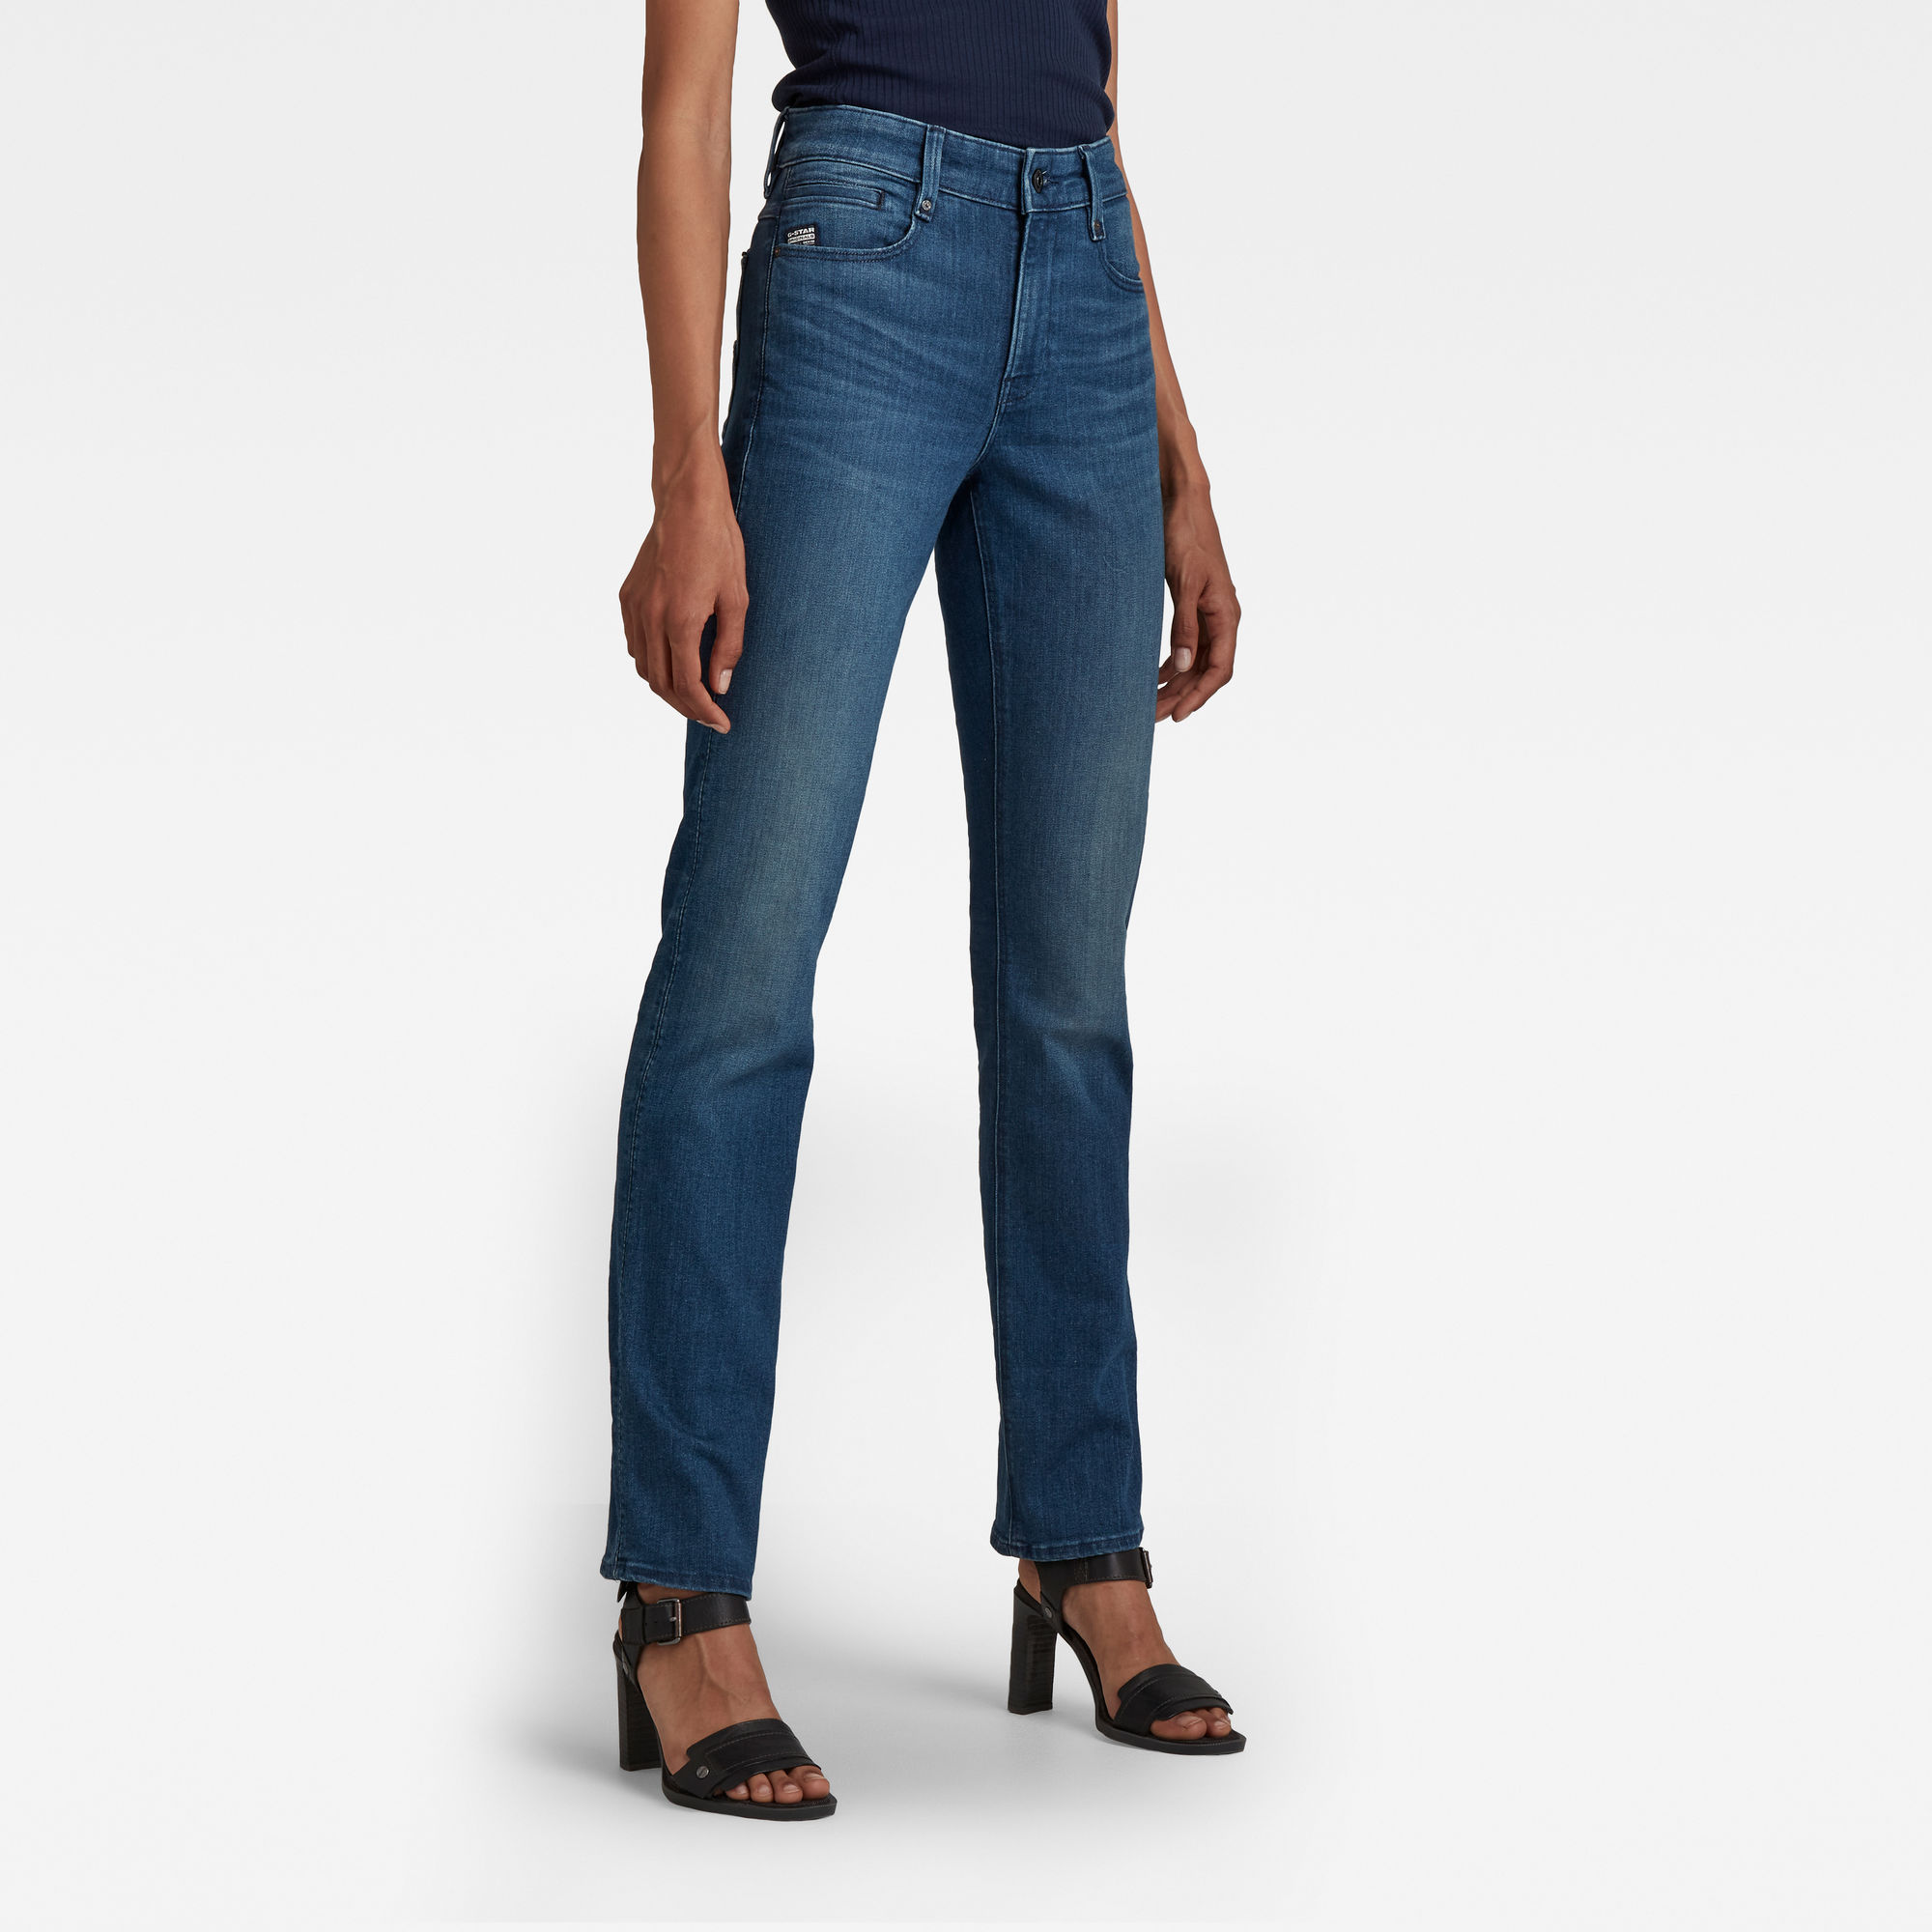 G-Star RAW Dames Noxer Straight Jeans Blauw